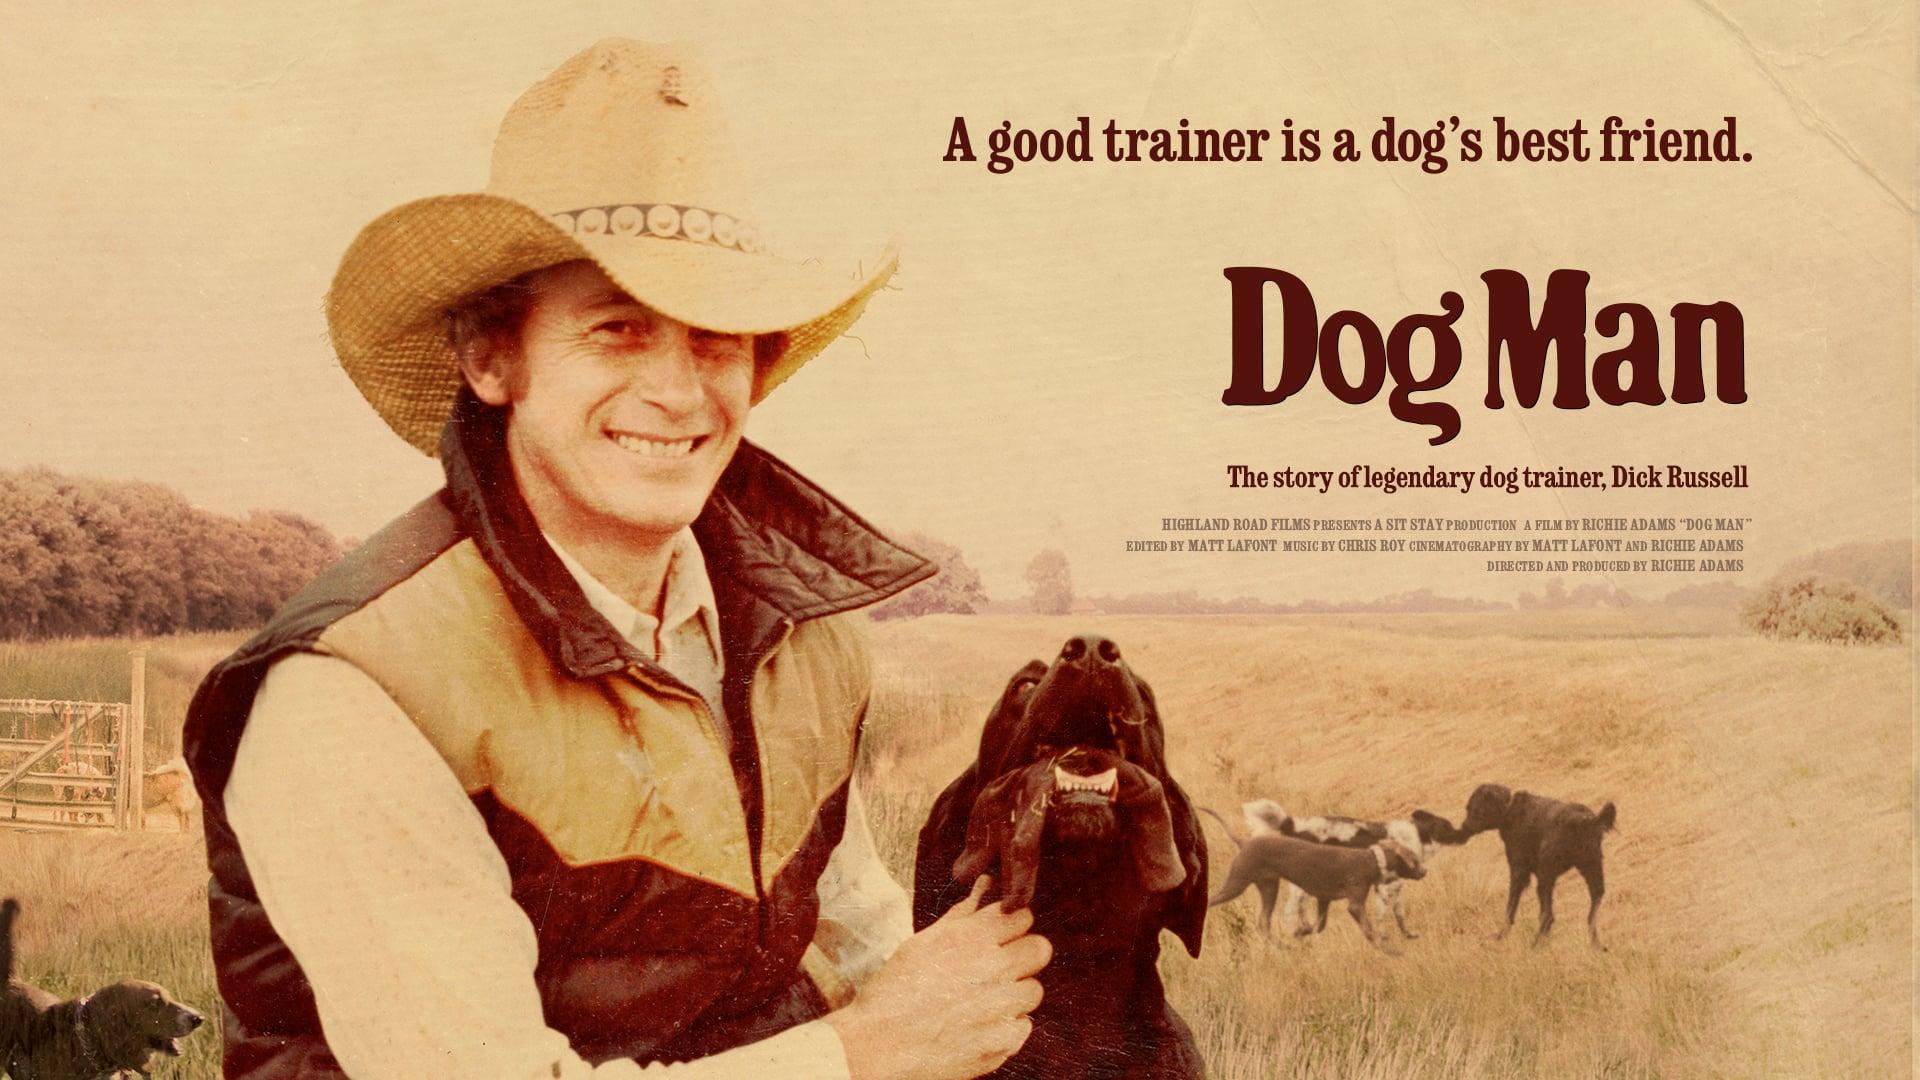 DOG MAN (2015 Documentary Feature —Trailer)